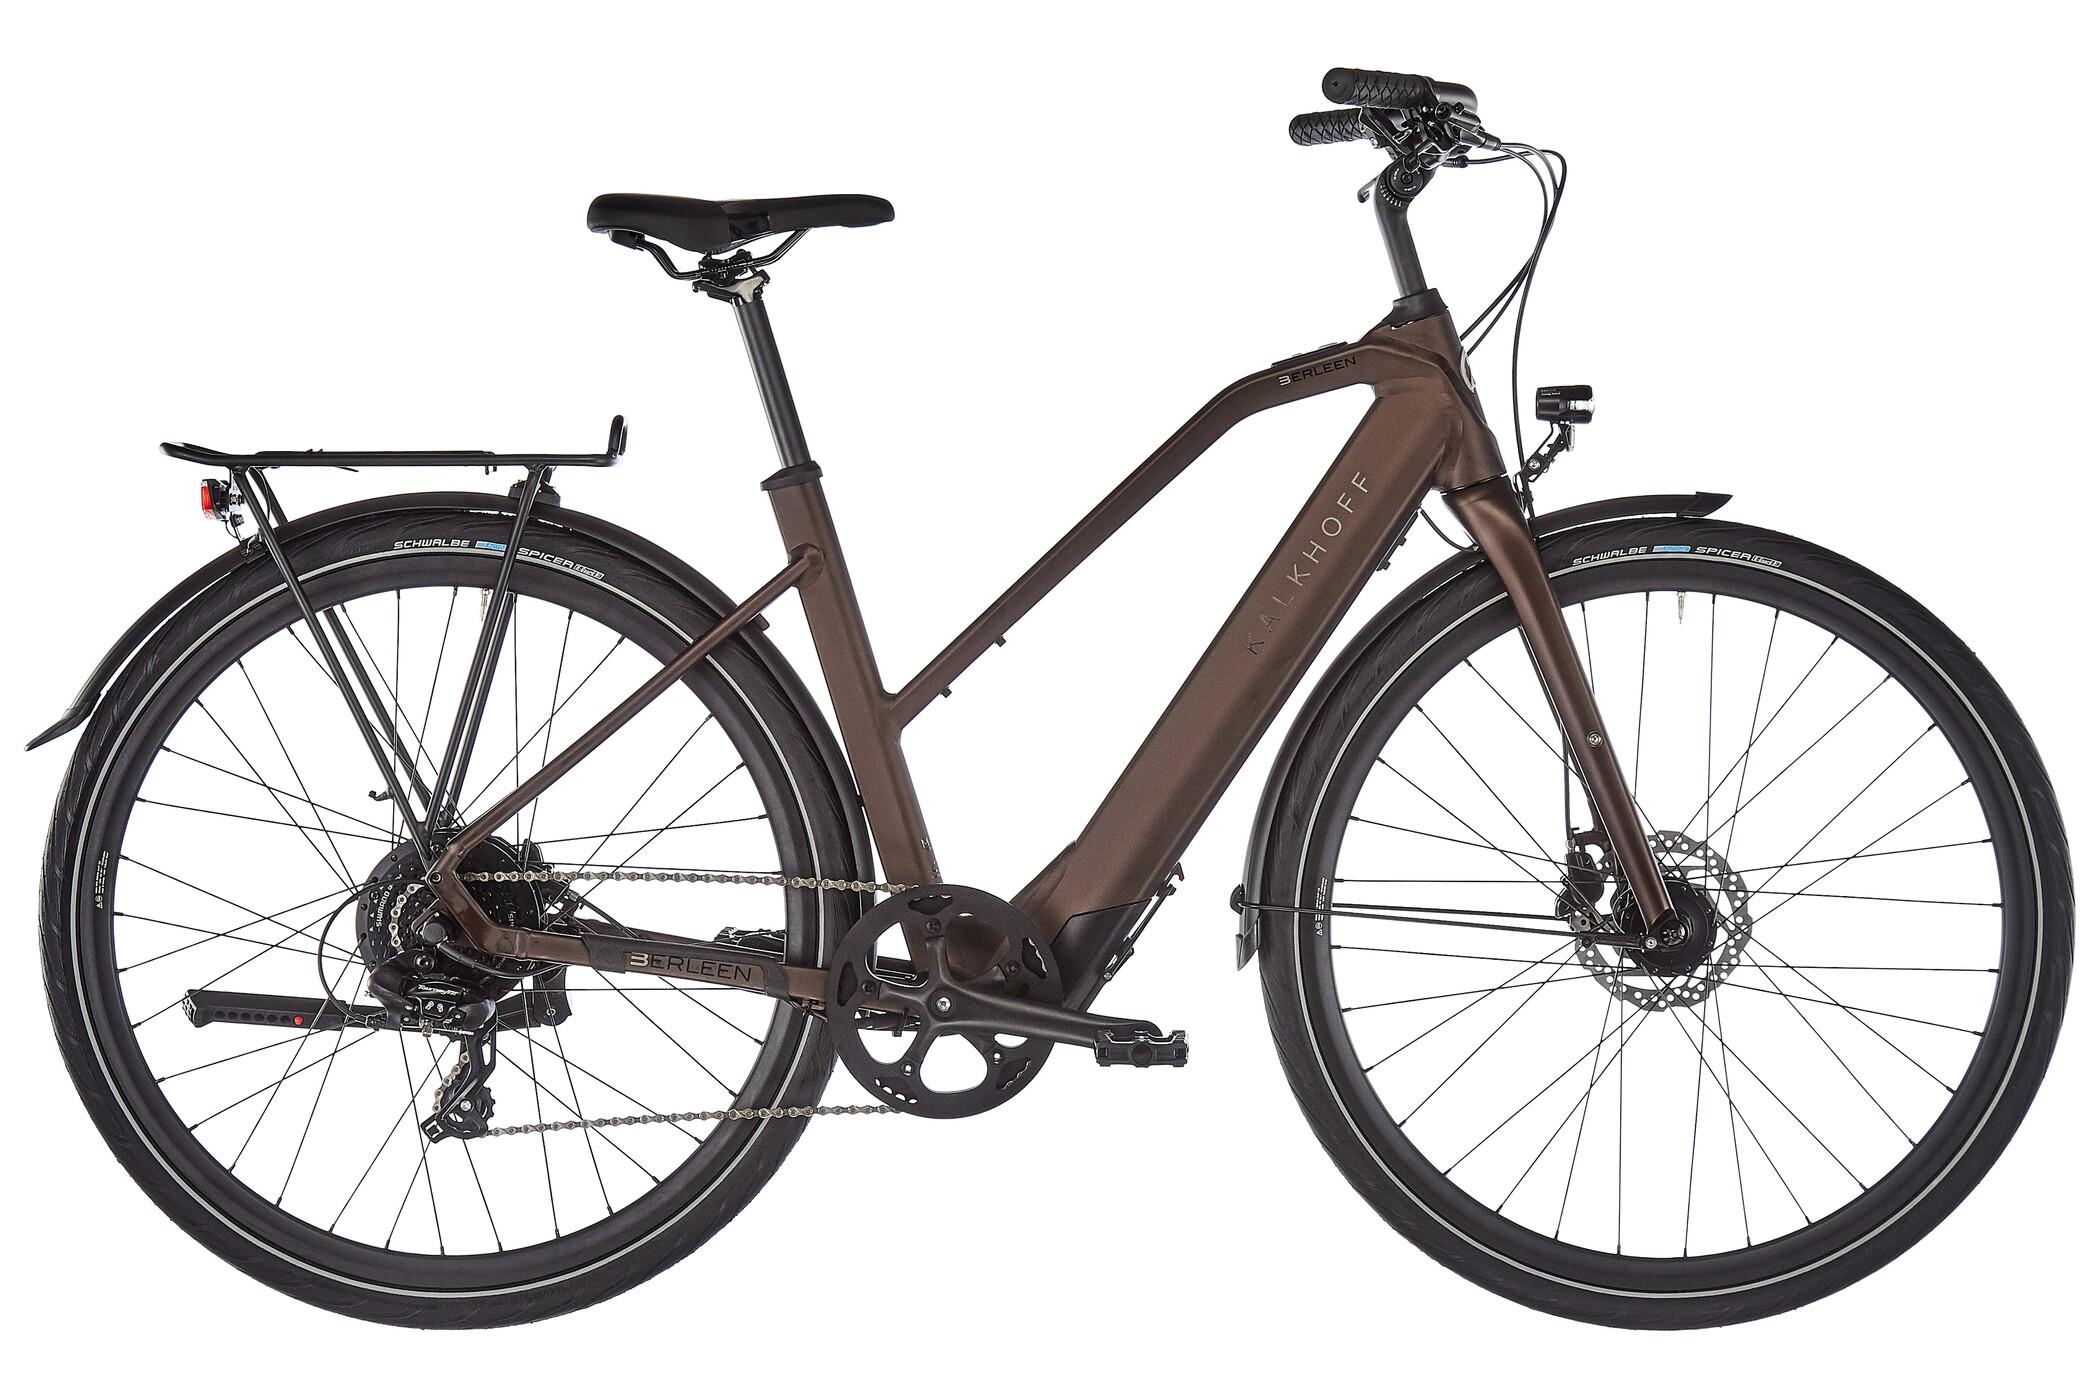 Kalkhoff Berleen 5.G Move Trapez 252Wh, toffeebrown matt | City-cykler